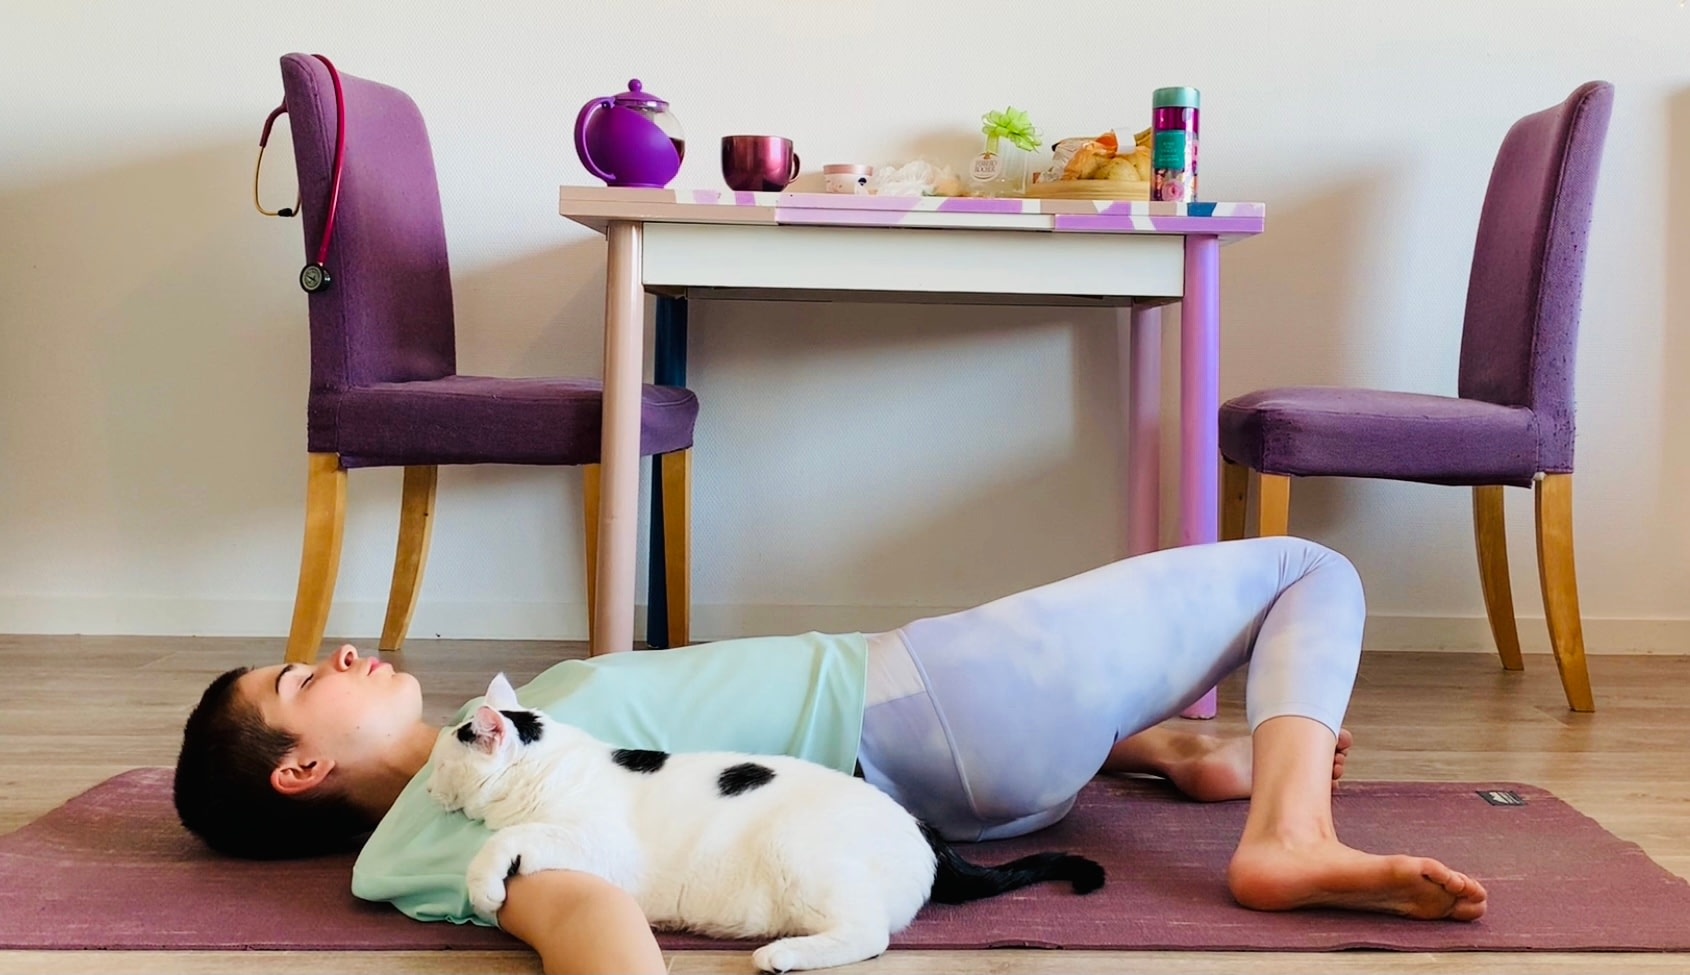 menopause constipation yoga.PNG yoga menopause constipation